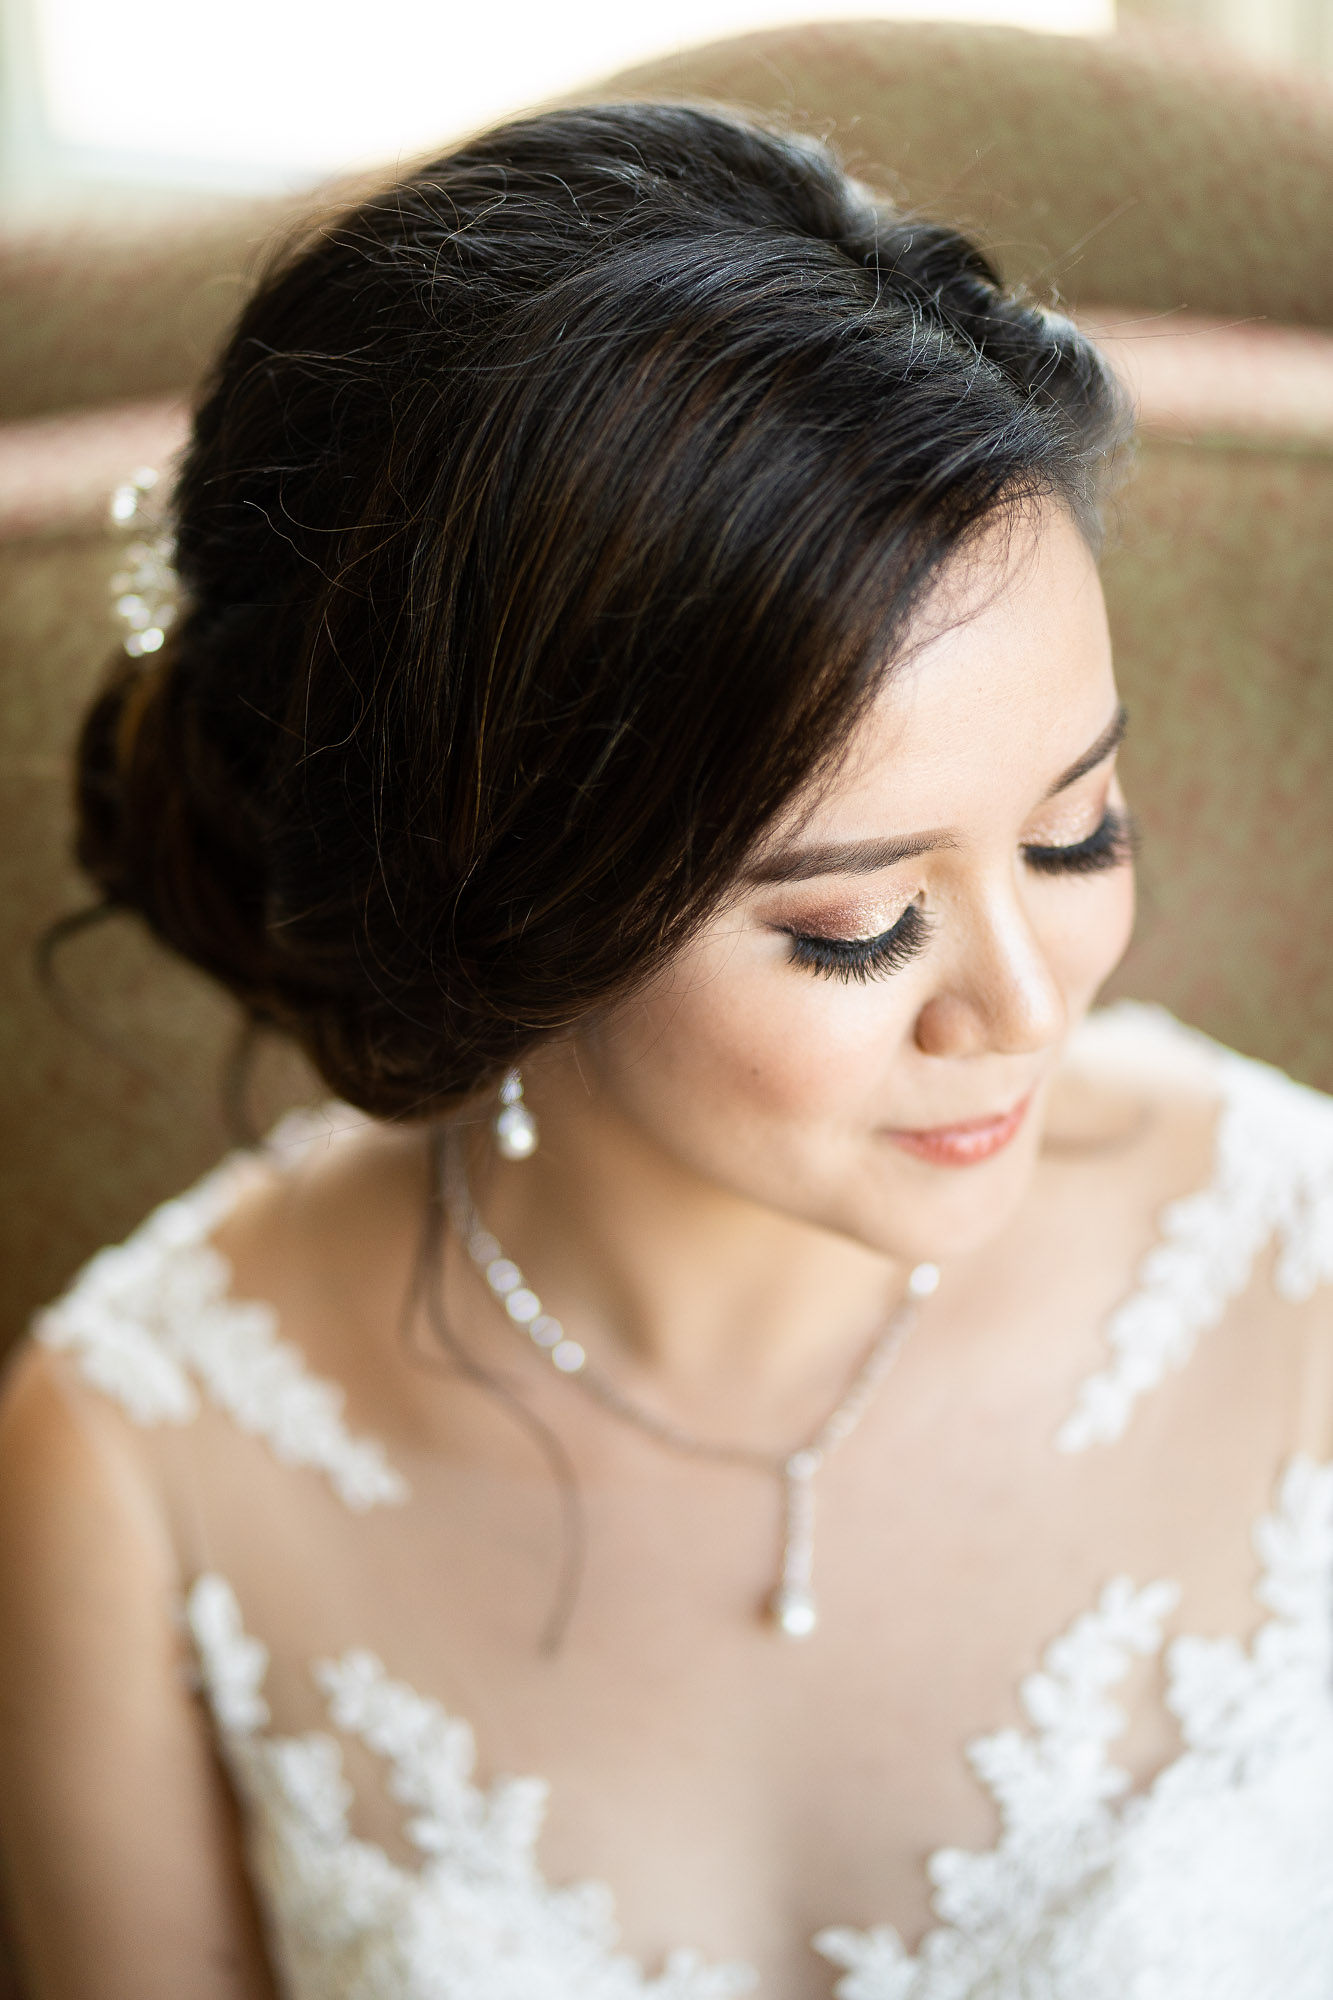 Resized-S&S-WeddingHighlights-9.jpg